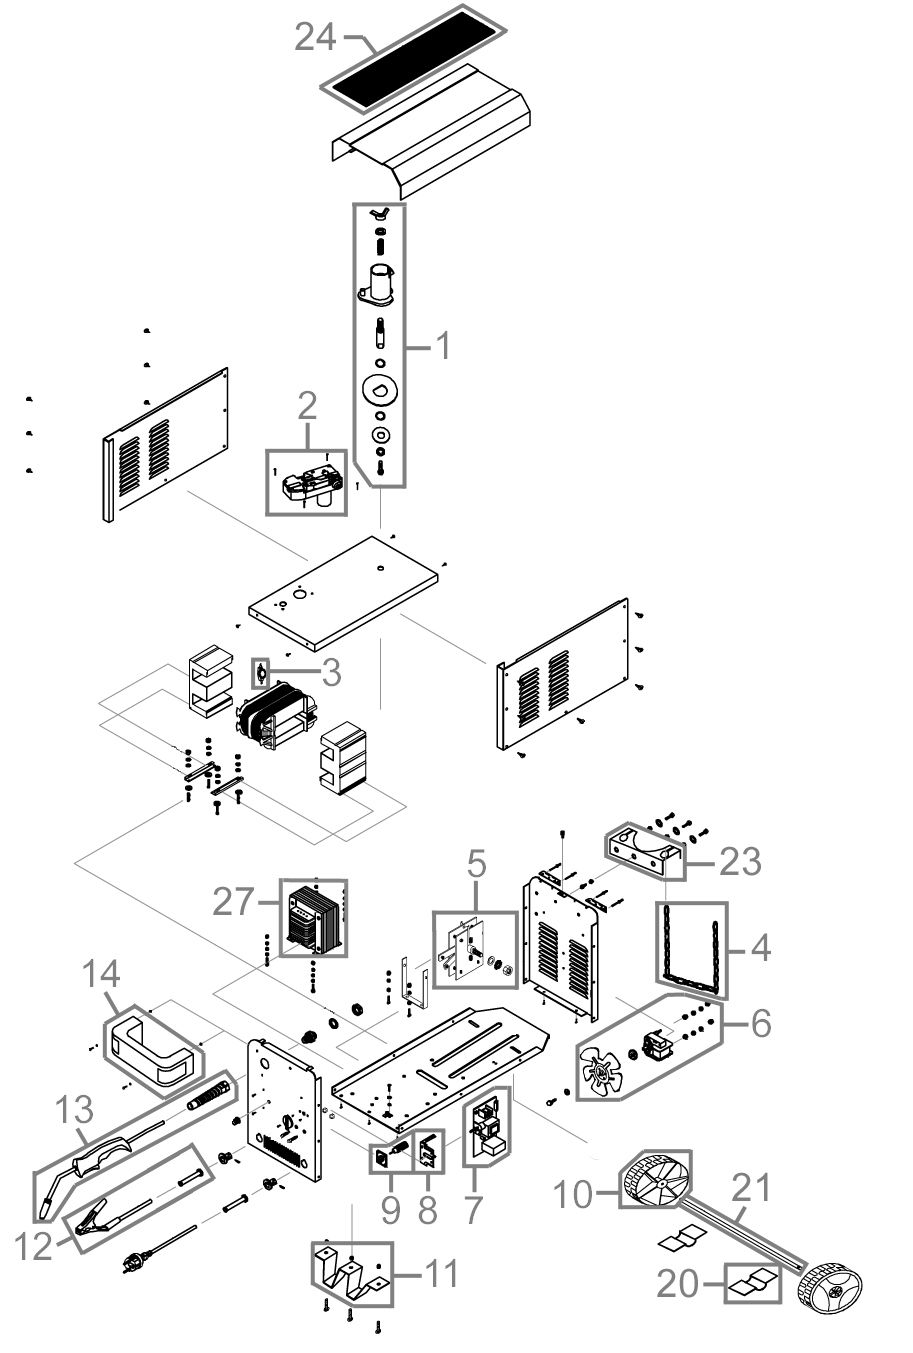 g de schutzgas schweissger t mig155 6w serie 64188 ersatzteile. Black Bedroom Furniture Sets. Home Design Ideas